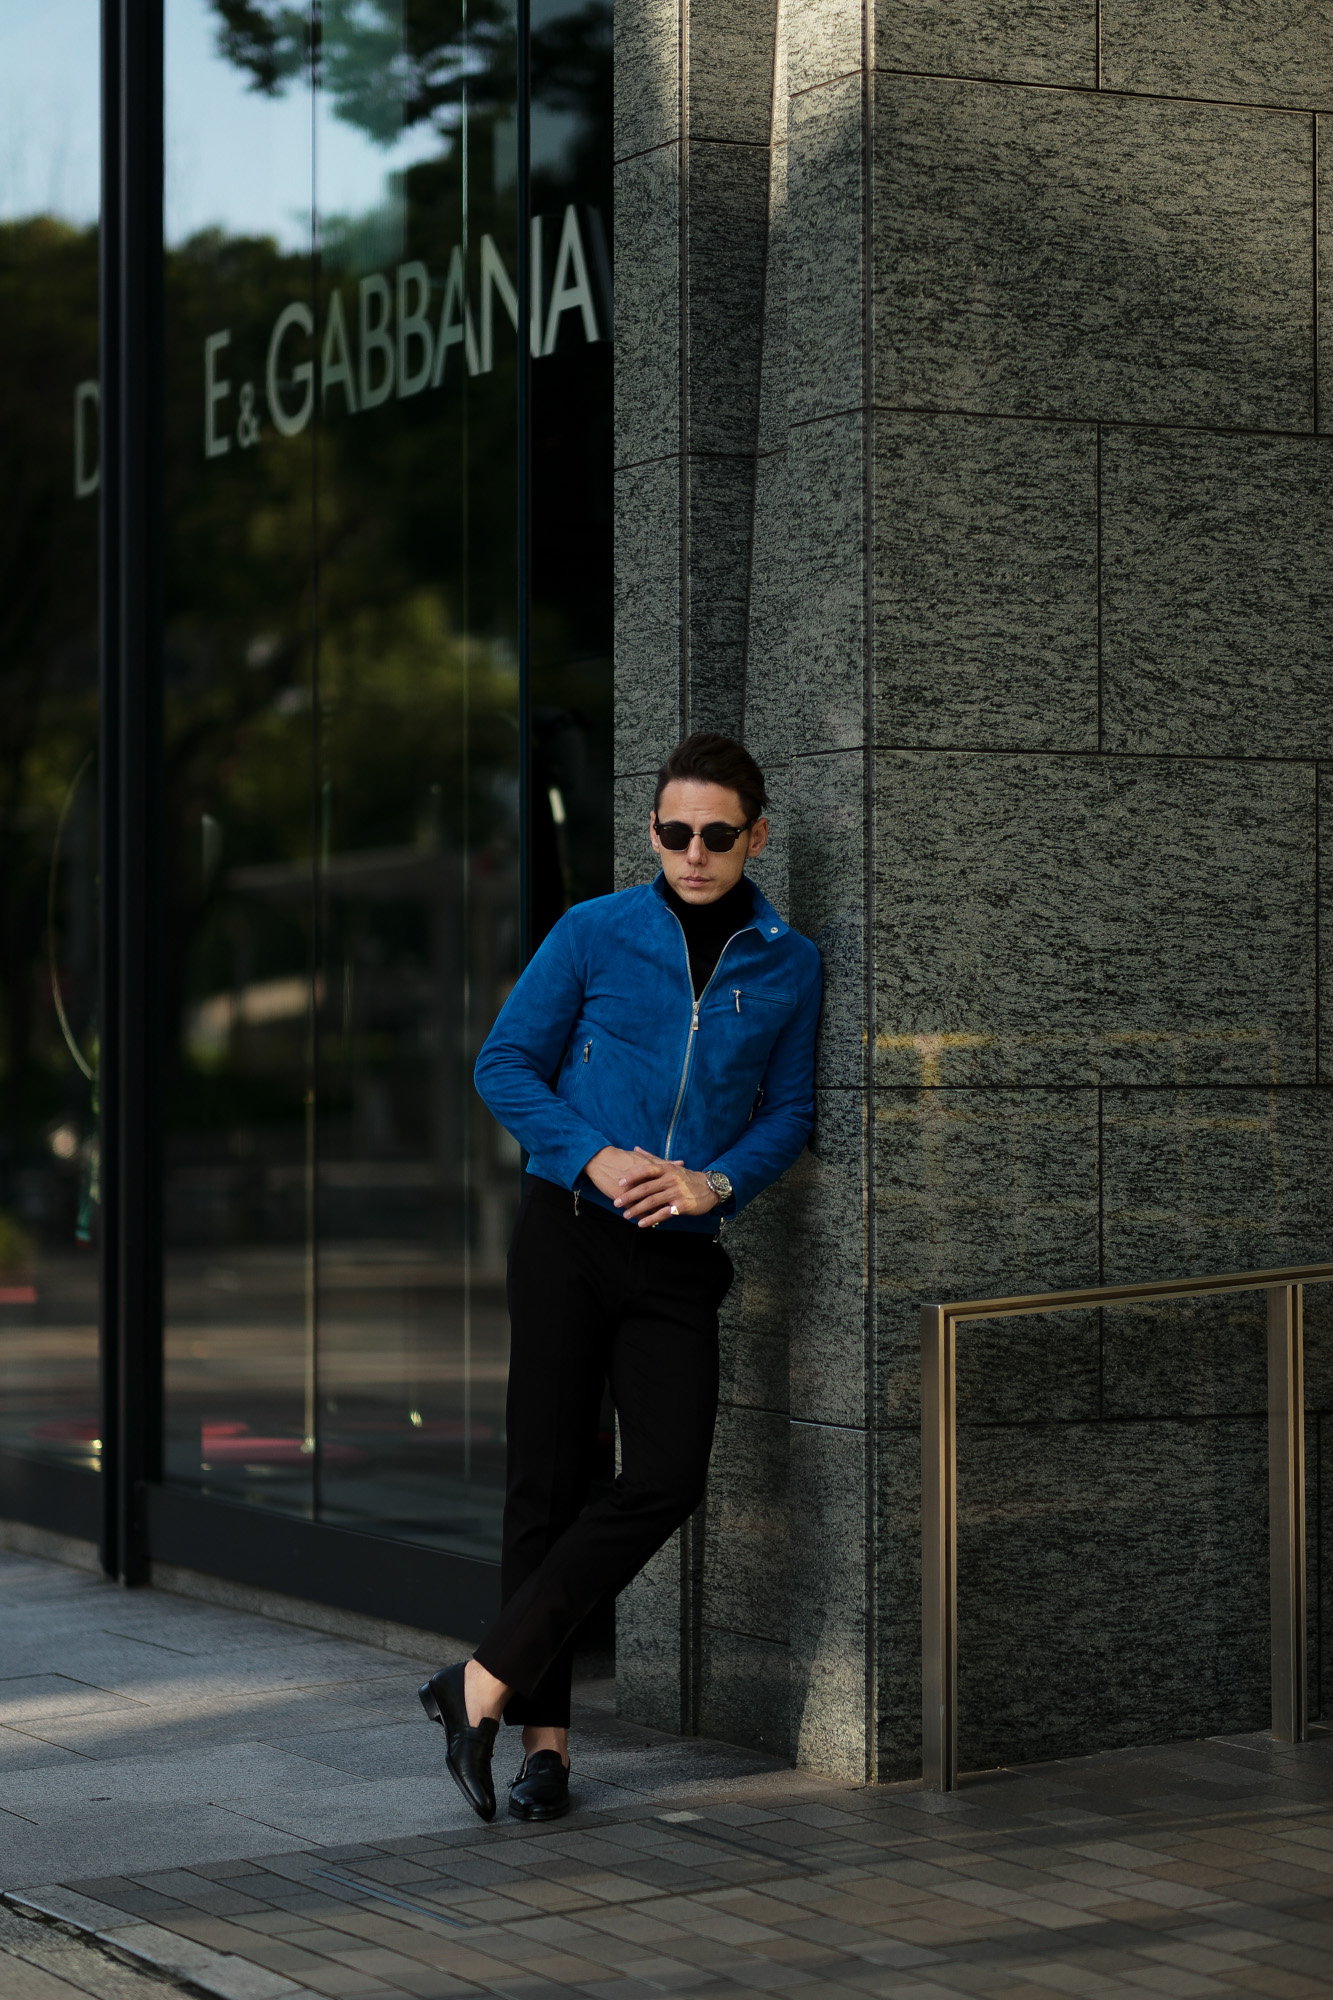 SILENCE(サイレンス) Single Leather Jacket (シングルレザー ジャケット) Goat Suede Leather (ゴートスエード レザー) シングル ライダース ジャケット COBALTO (ブルー) Made in italy (イタリア製) 2020 秋冬 【Alto e Diritto限定モデル】【ご予約開始】愛知 名古屋 altoediritto アルトエデリット スエードレザー